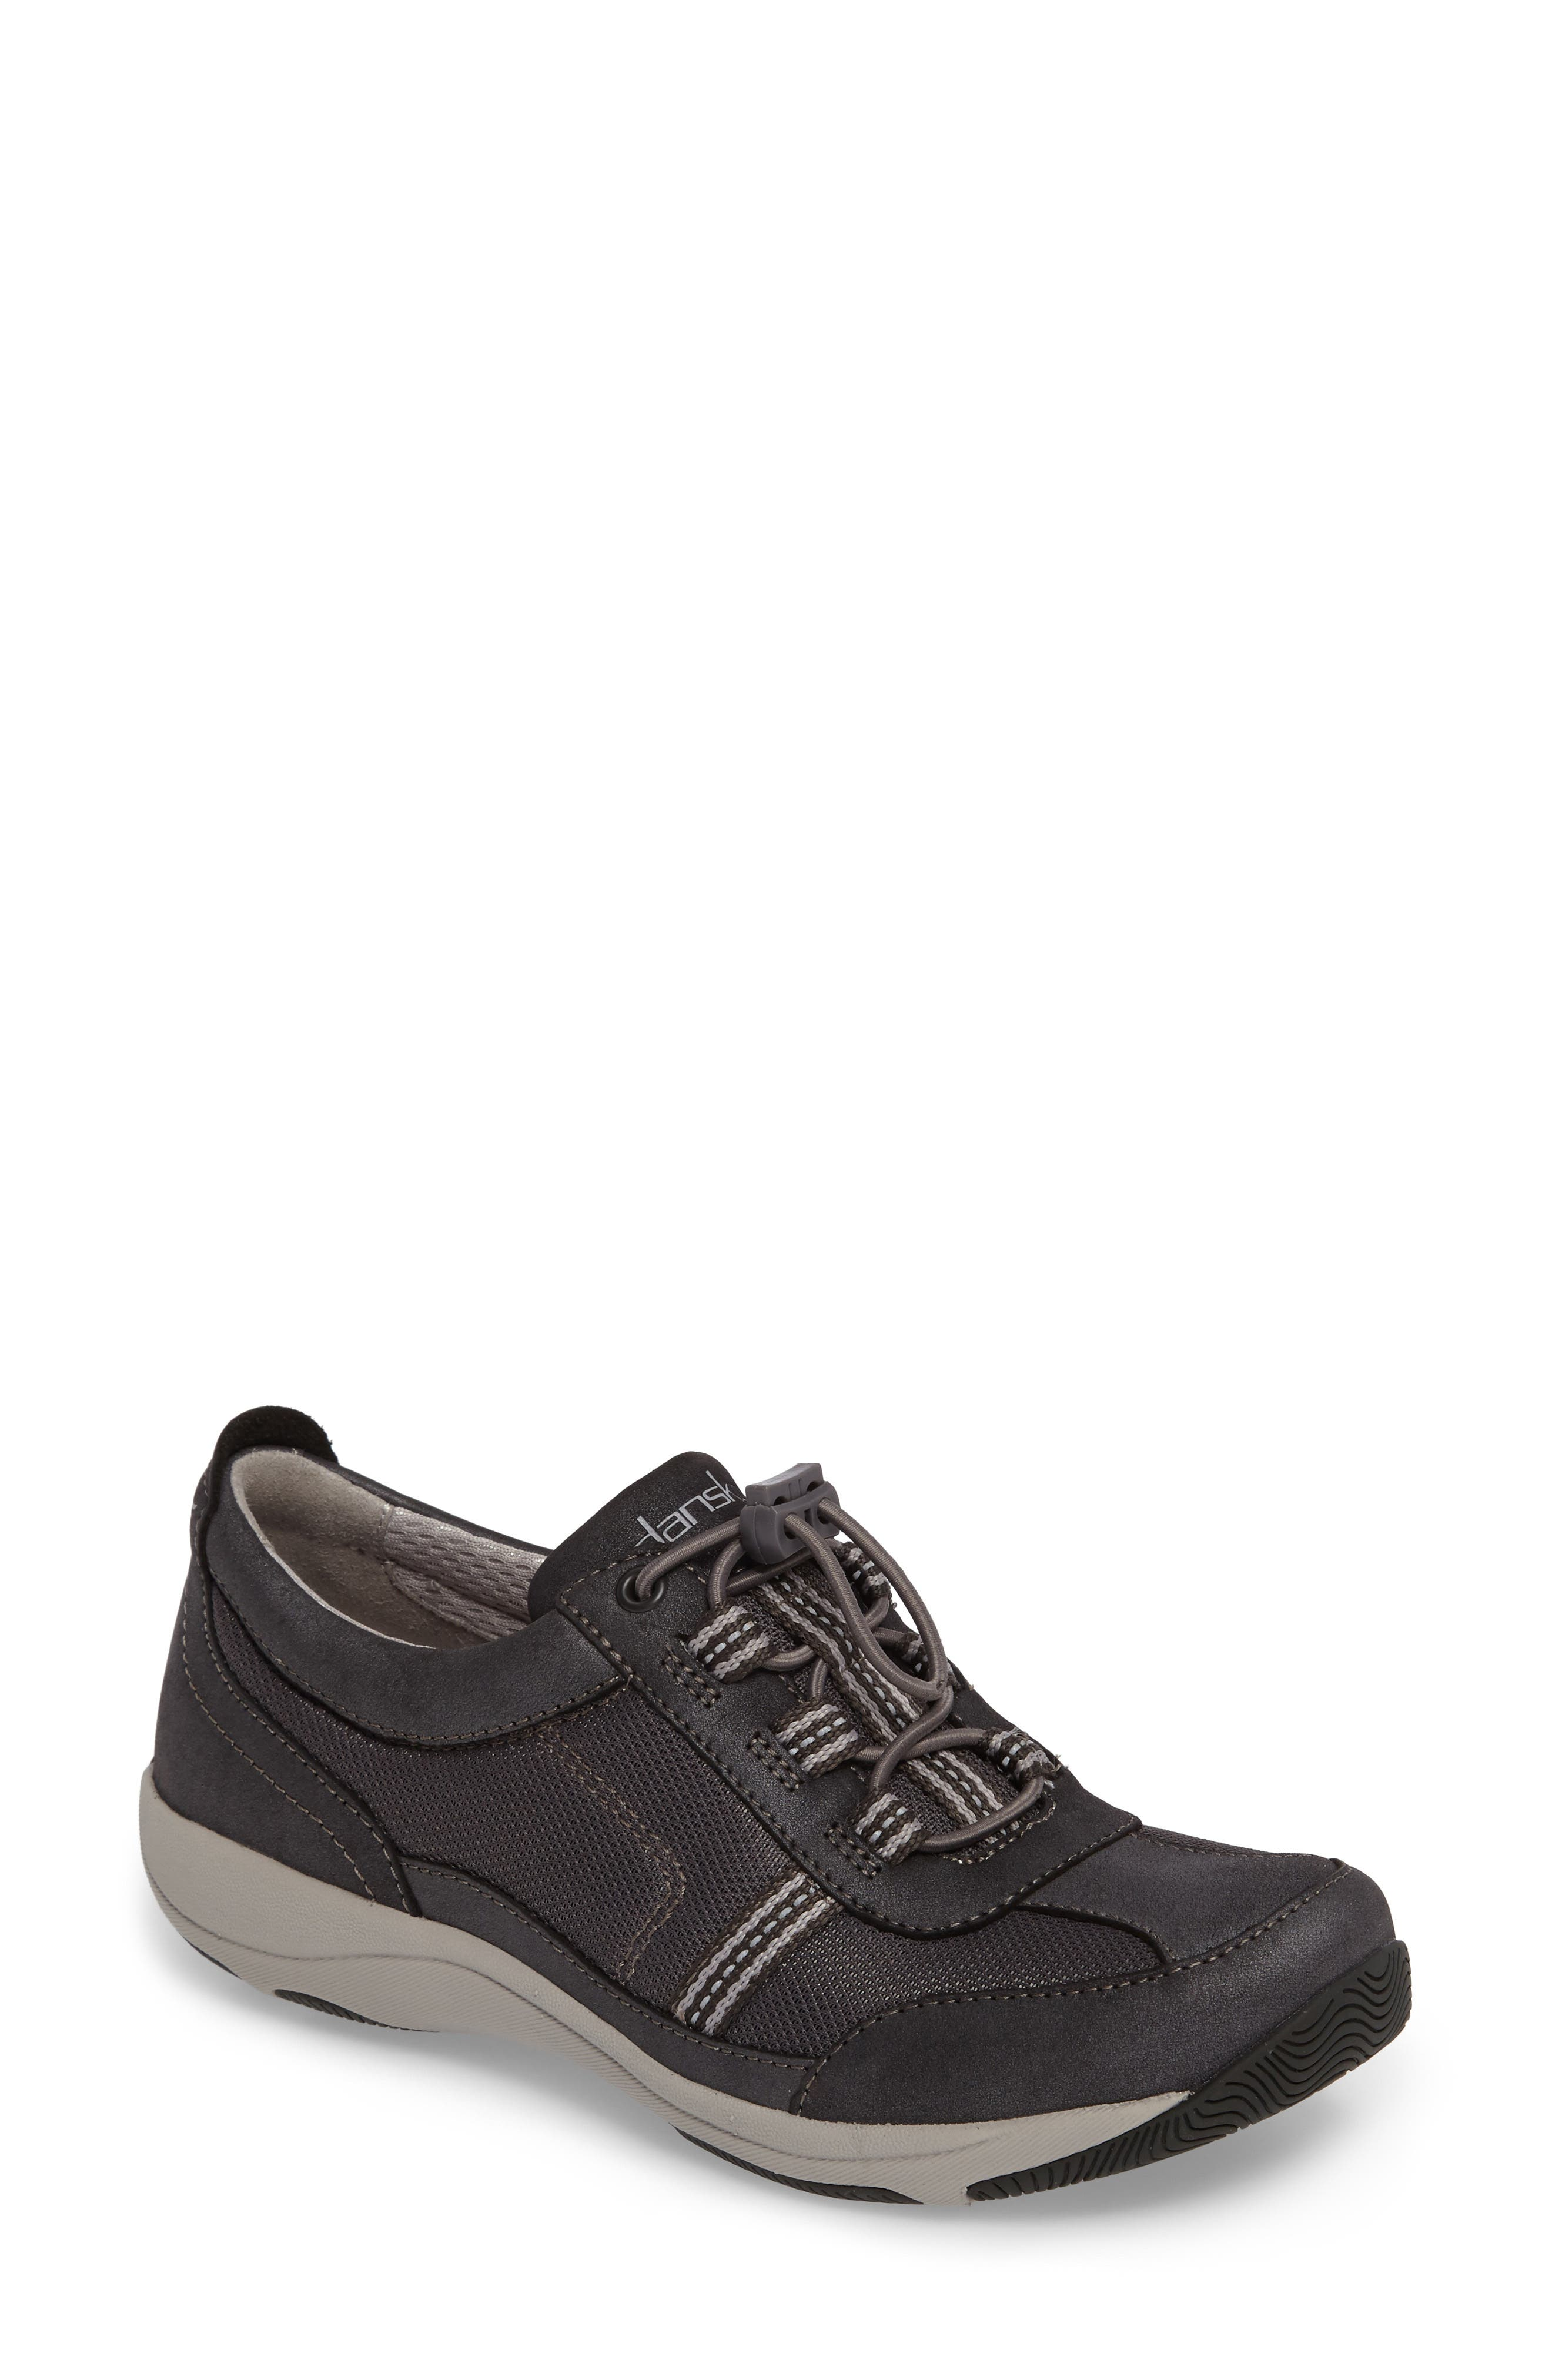 Alternate Image 1 Selected - Dansko 'Helen' Suede & Mesh Sneaker (Women)